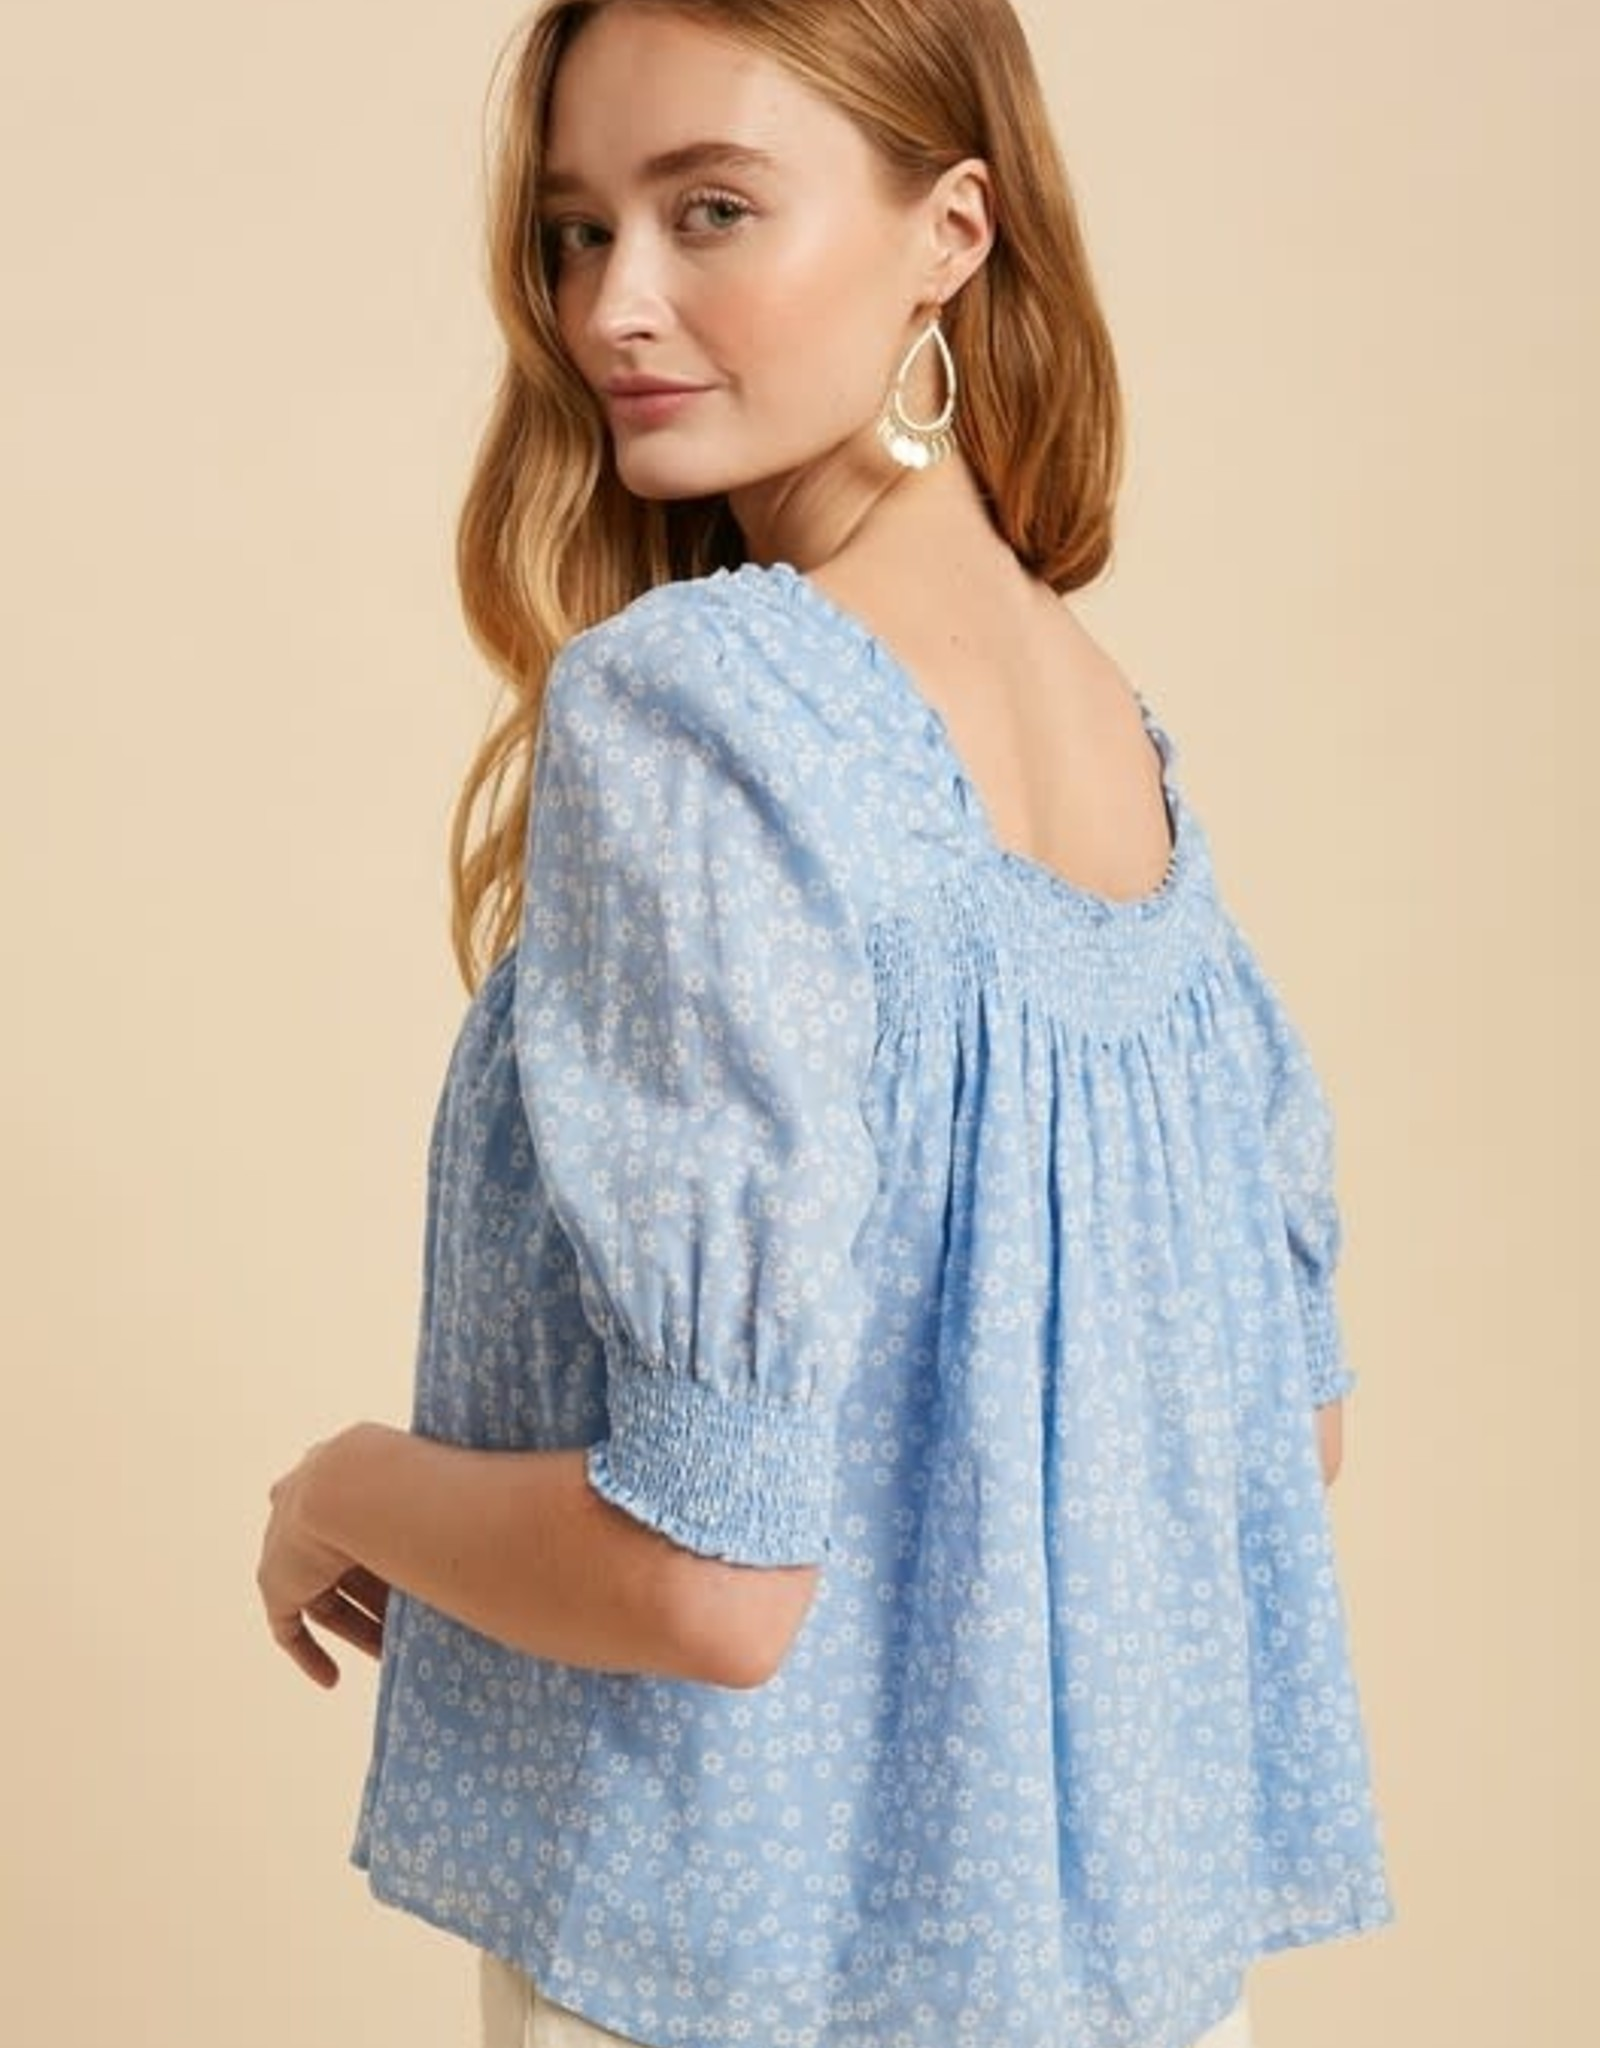 Miss Bliss Square Neck Daisy Print Blouse- Sky Blue